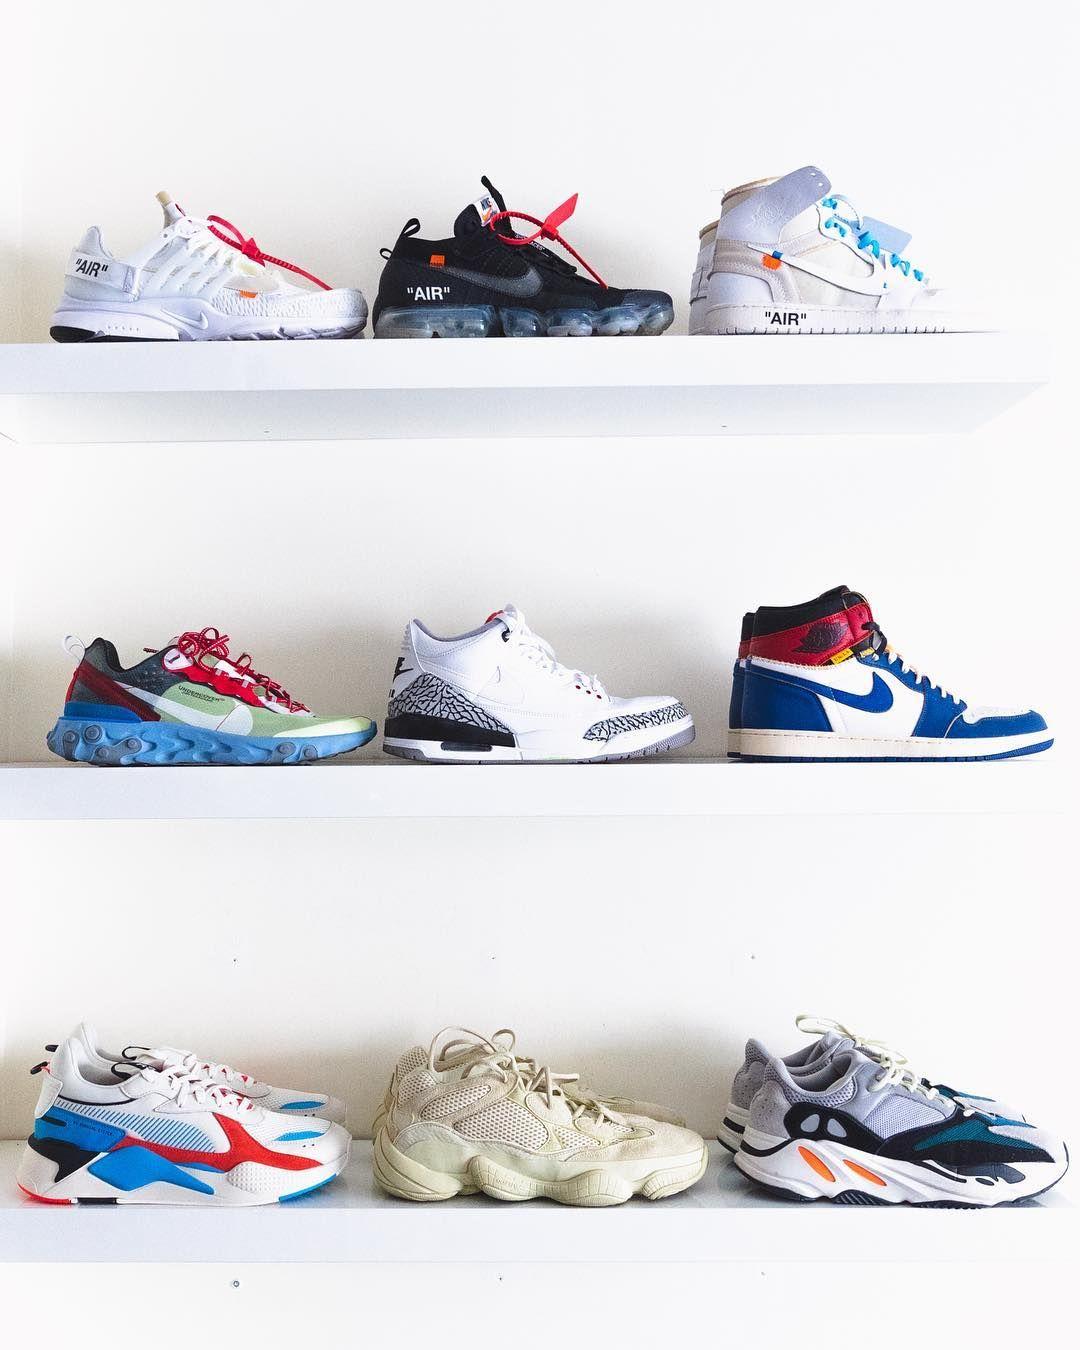 quality design a8dd6 8cfd8 Collection goals! ❤ 📷 by  kickstq  adidas  boost  grailify